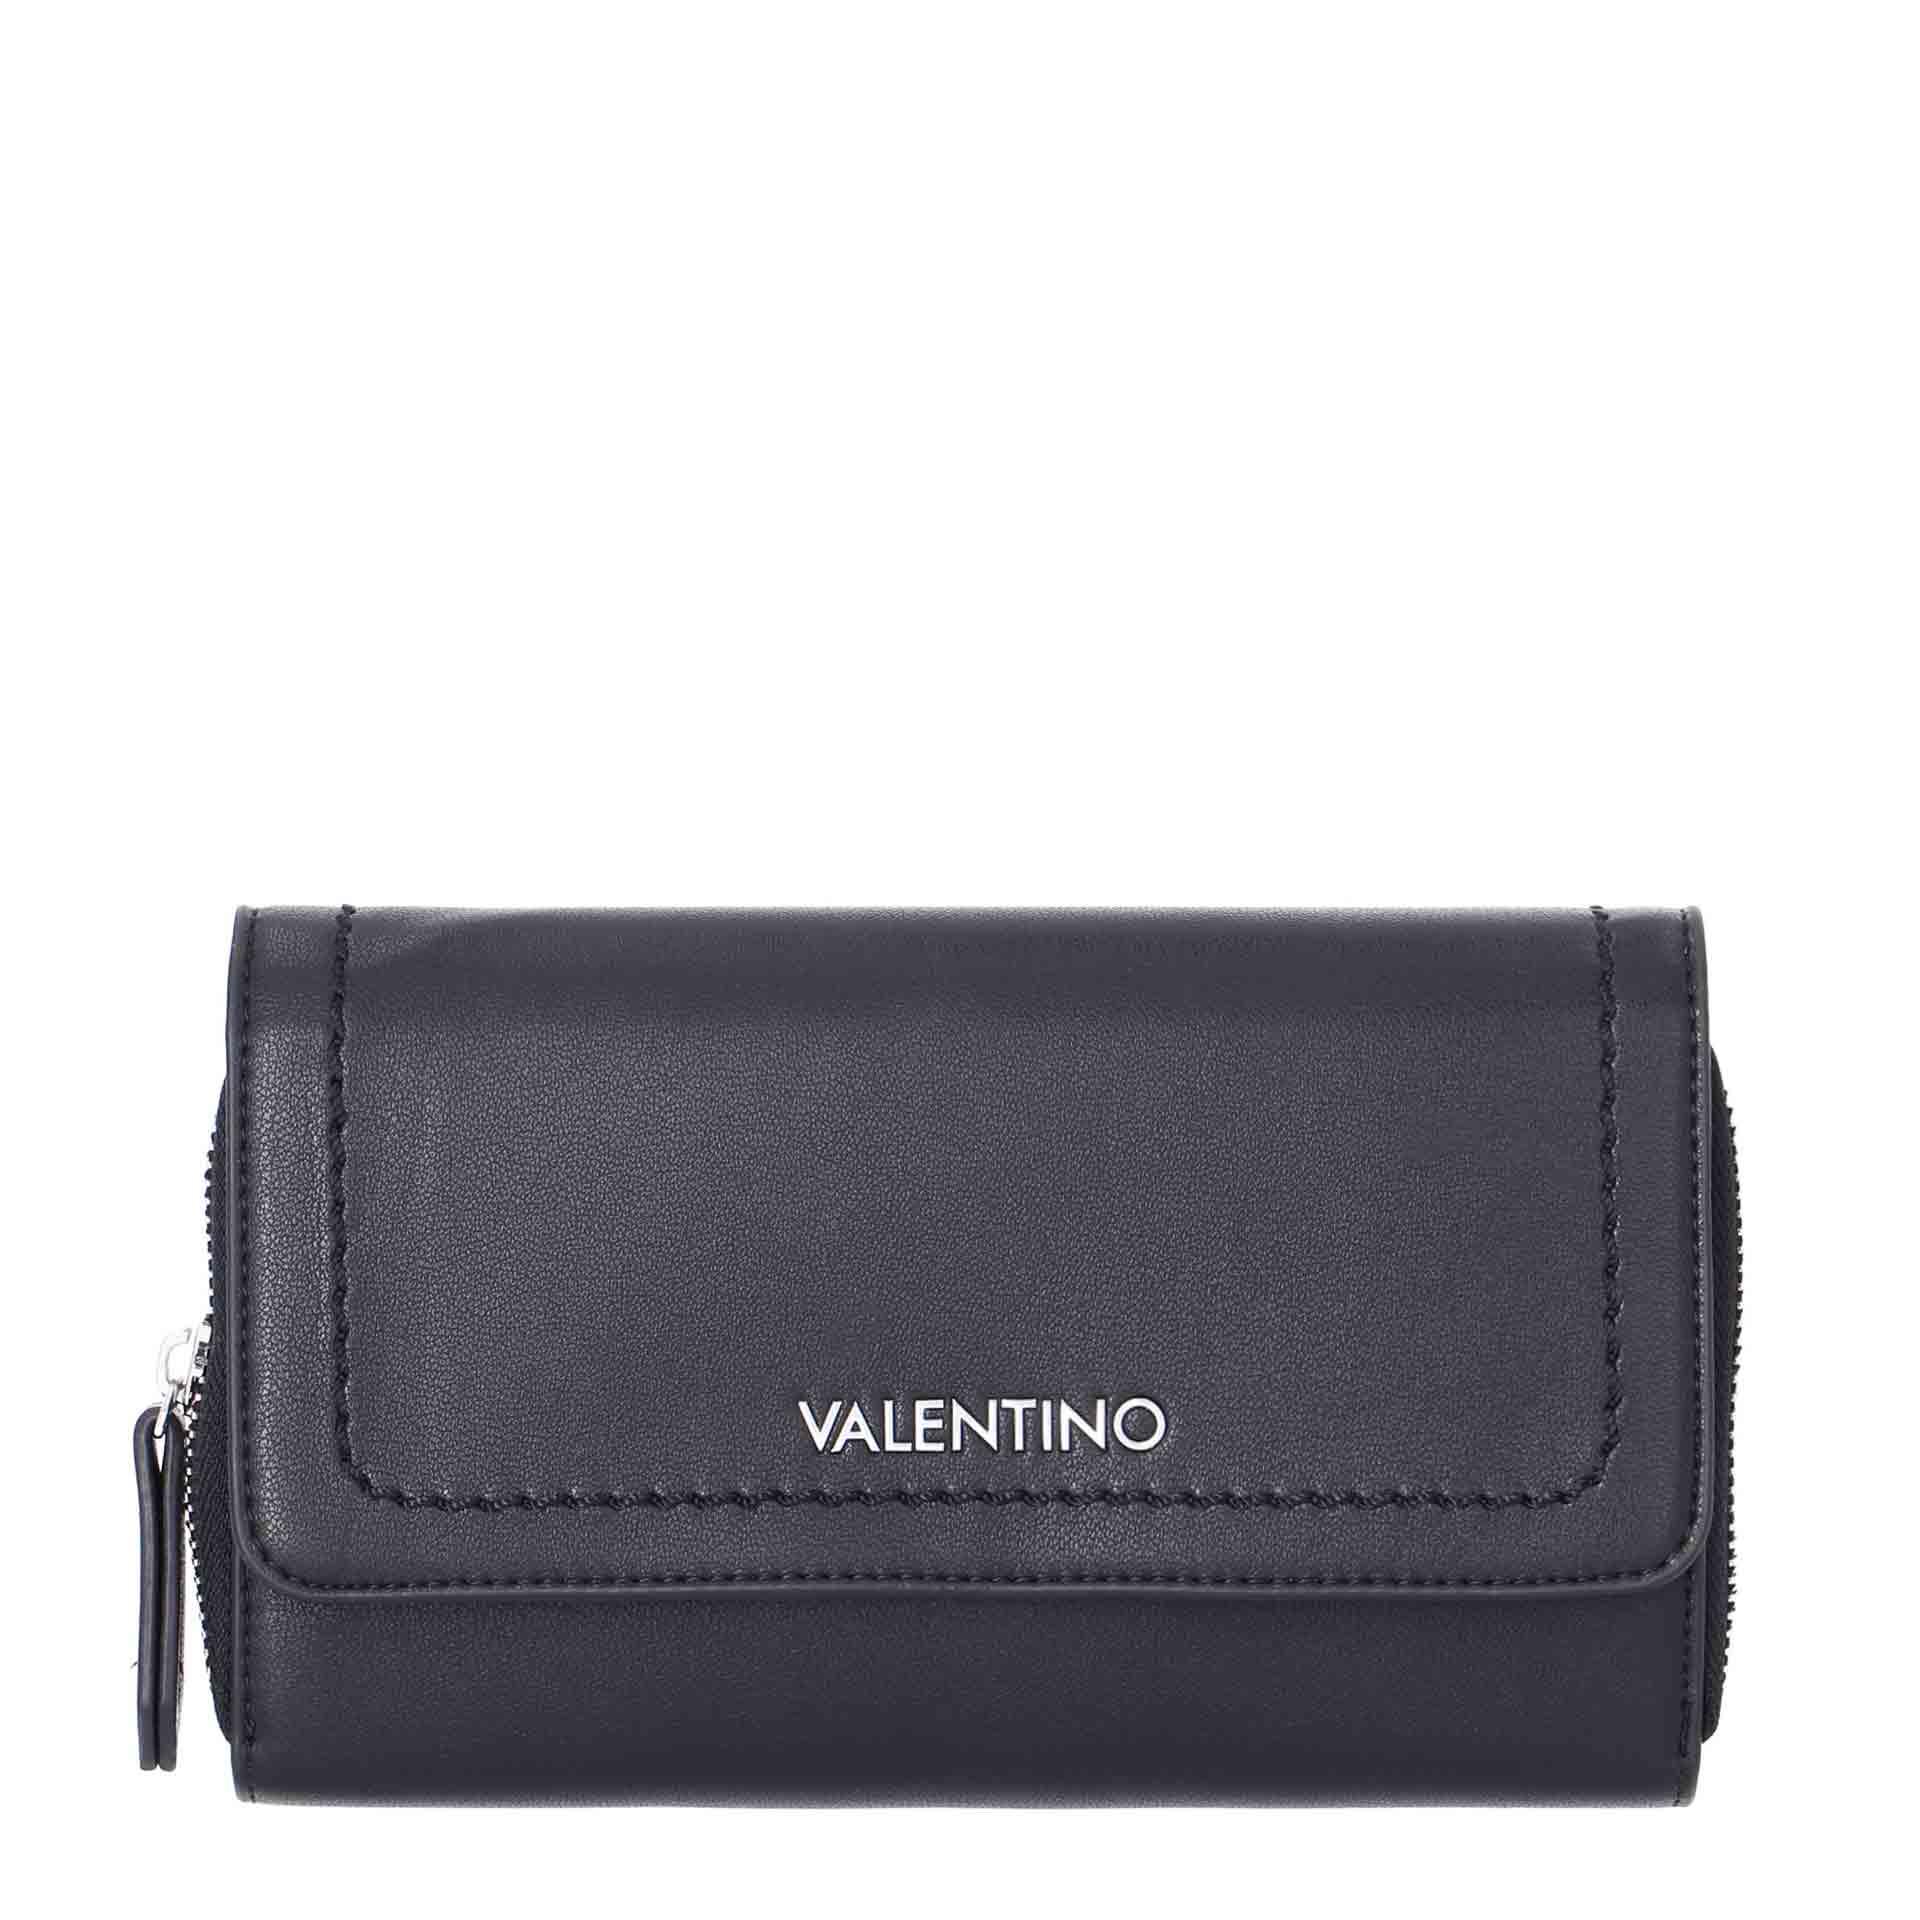 Valentino by Mario Valentino Elm Wallet on a Chain nero